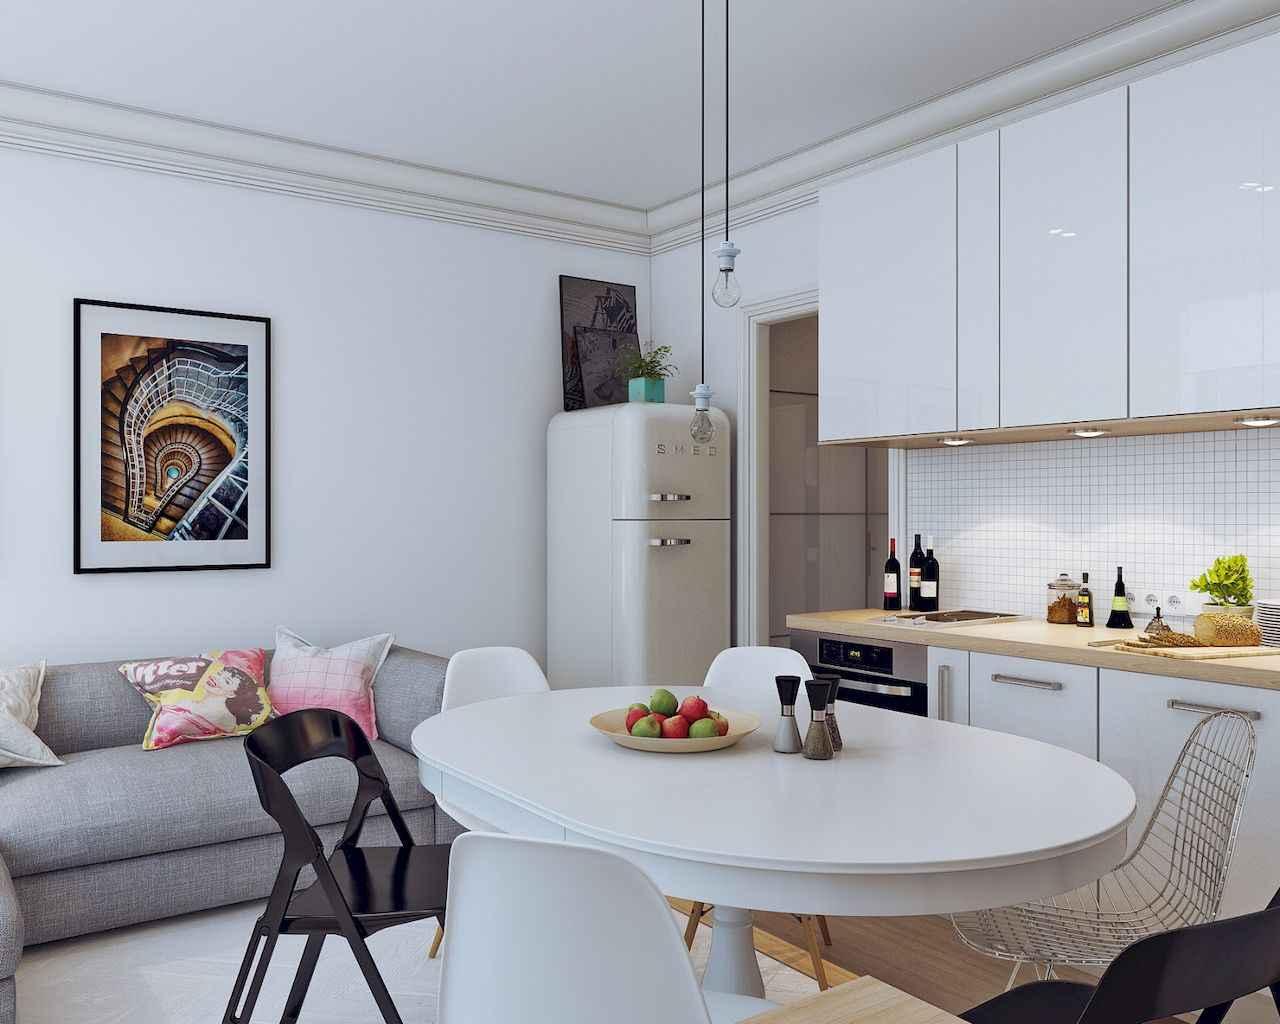 80 Stunning Apartment Dining Room Decor Ideas (62)